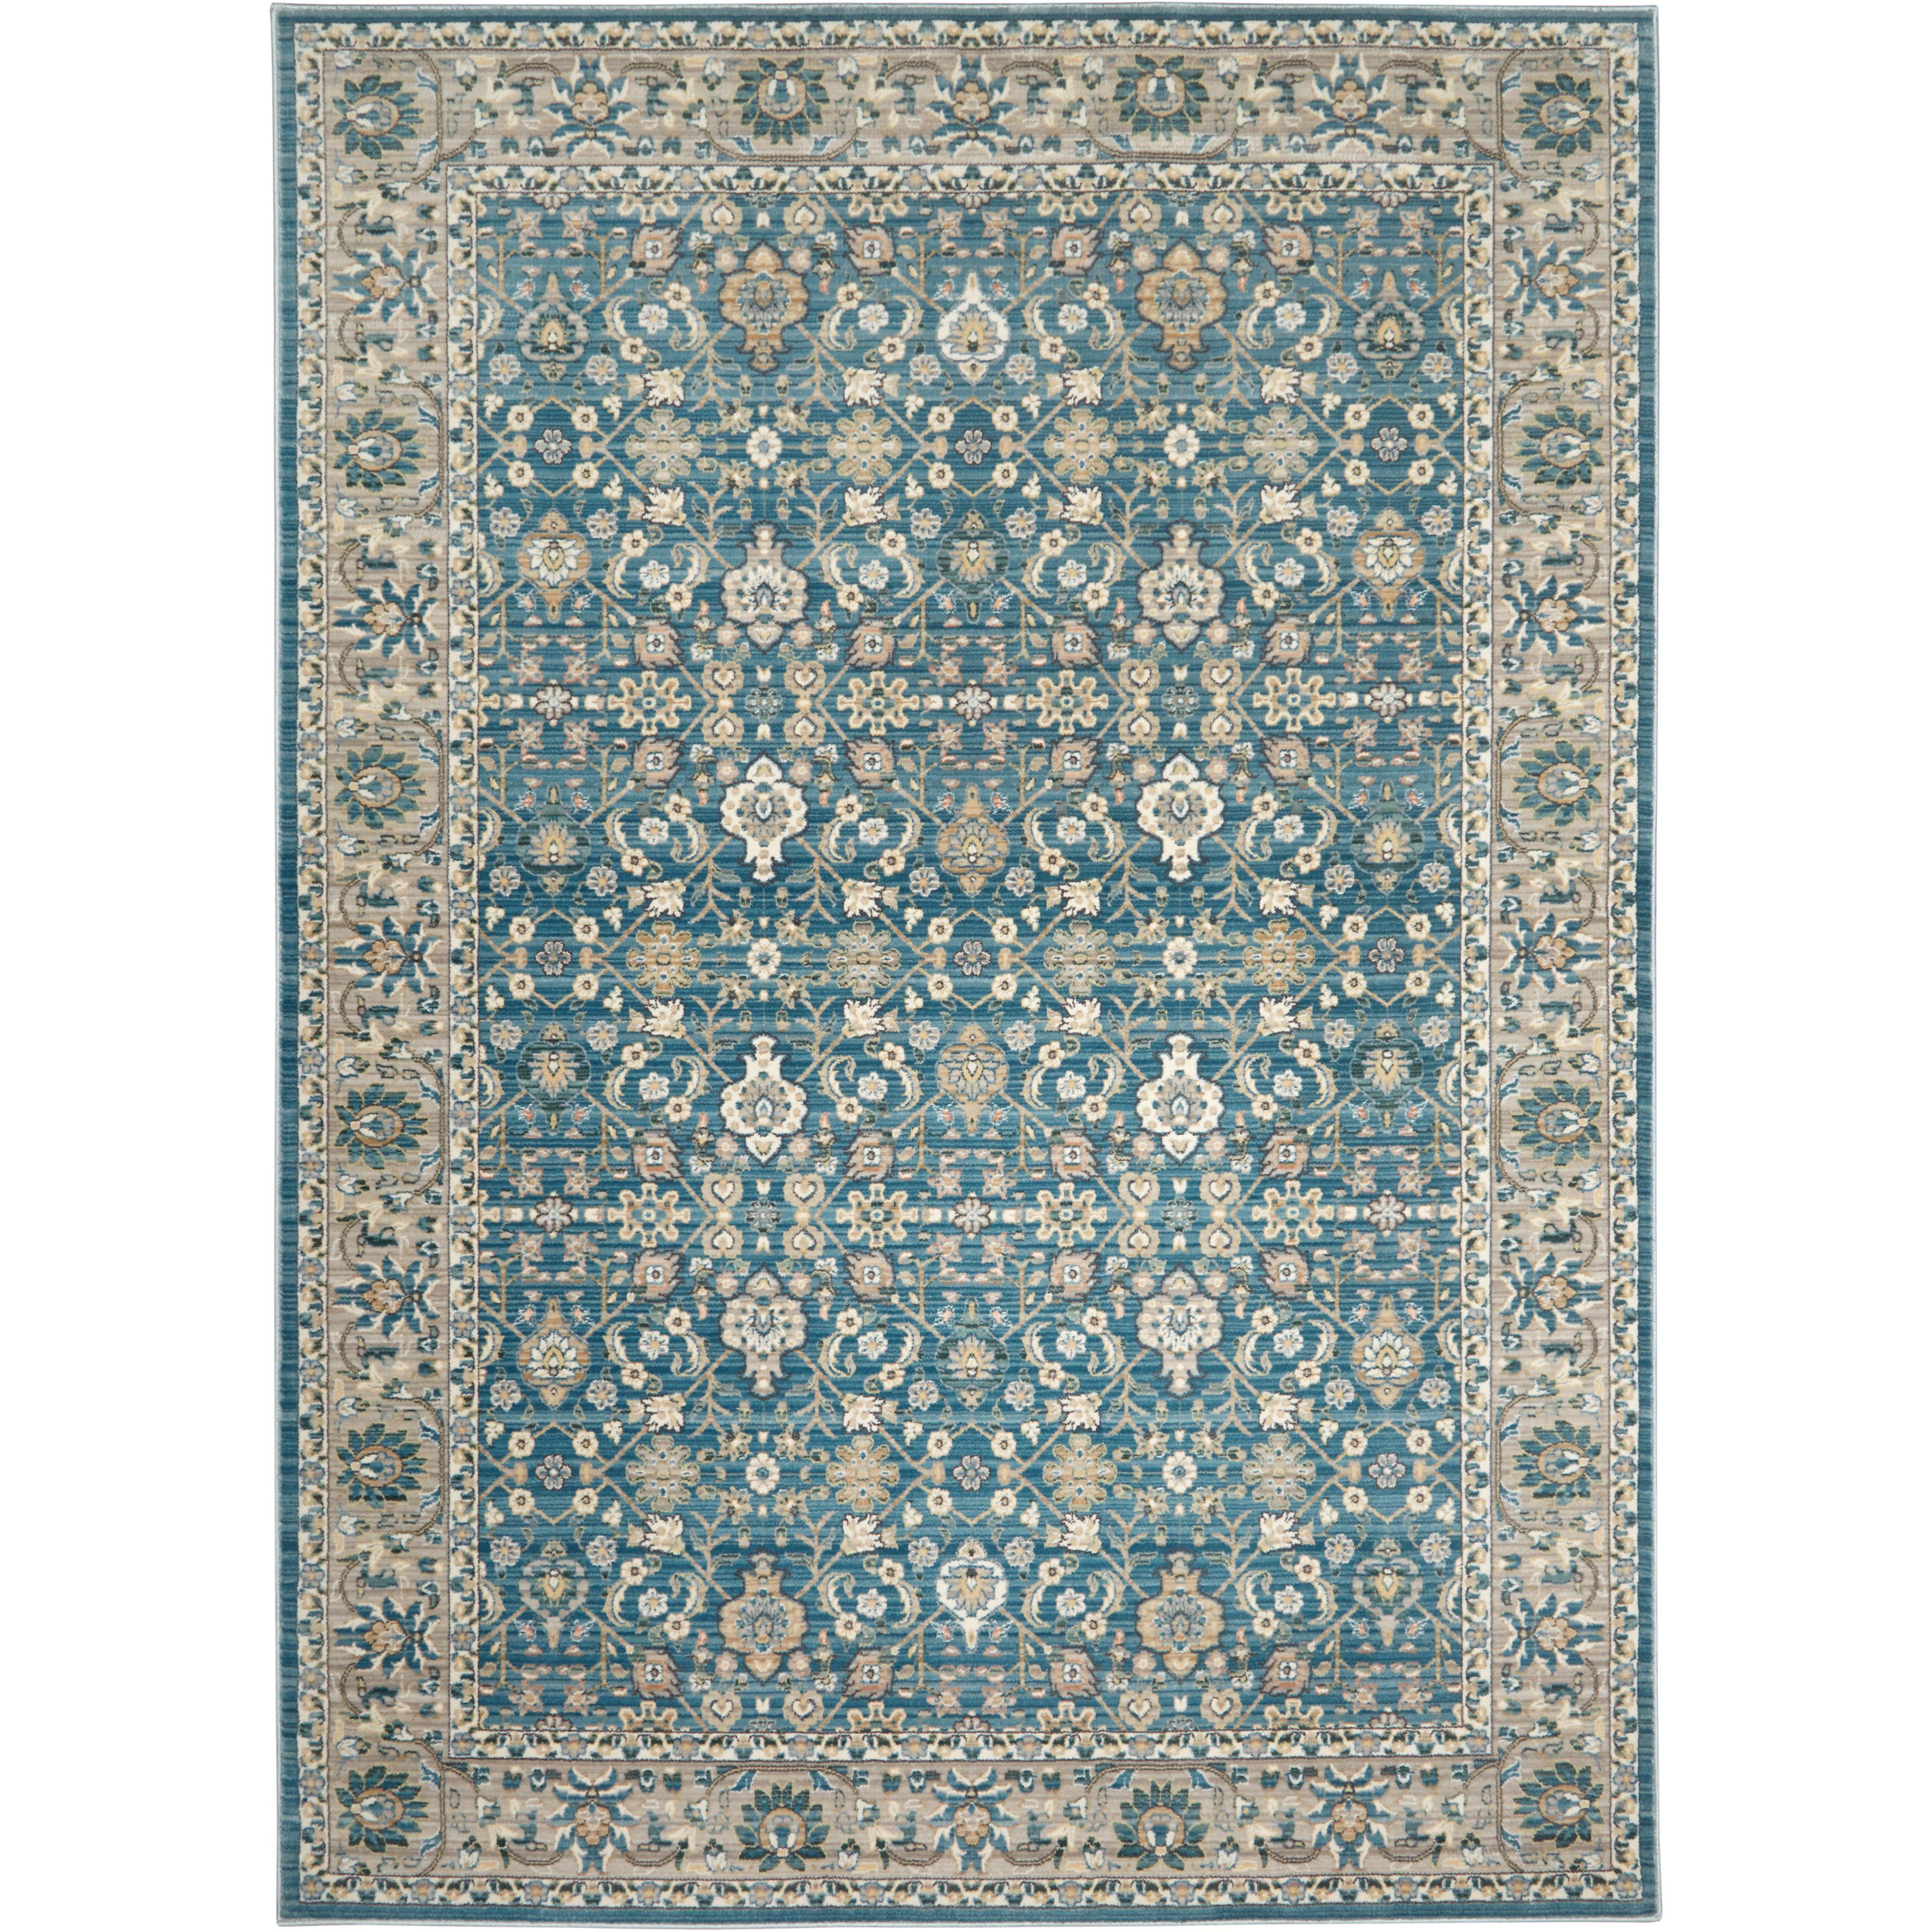 Salon Taupe Et Turquoise juliet floral border ivory/gray/blue area rug